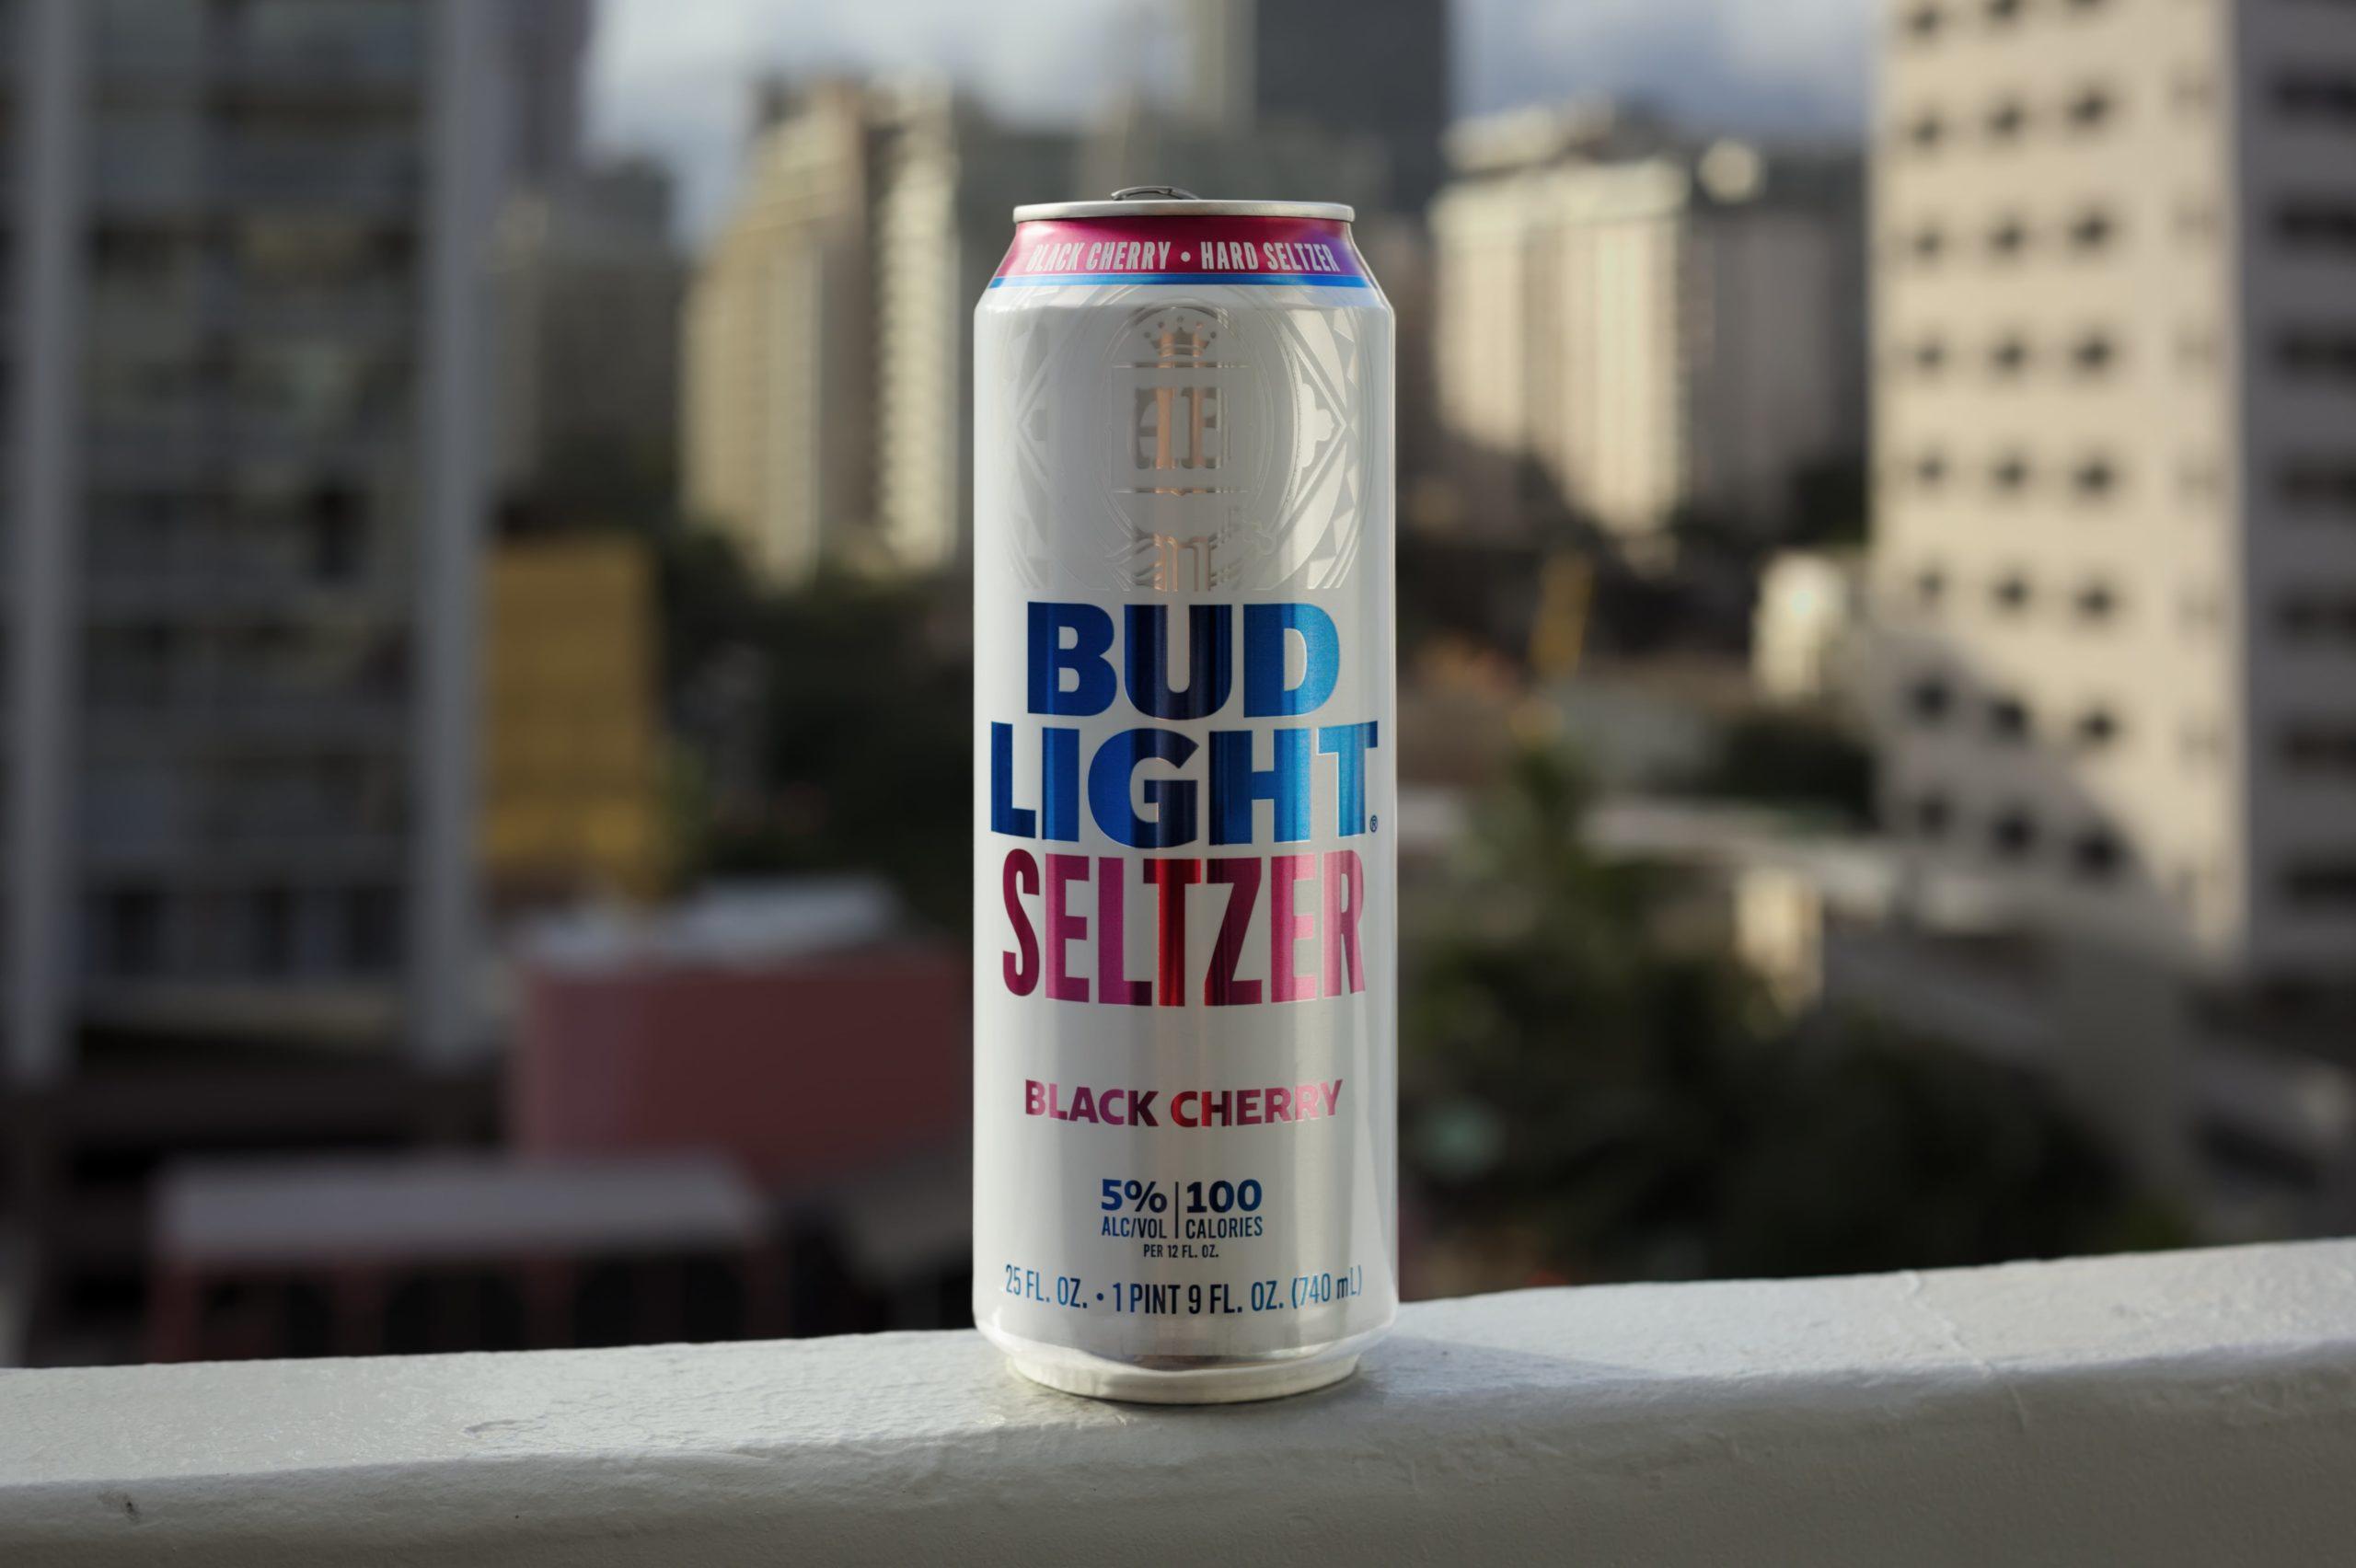 Bud Light Seltzer can